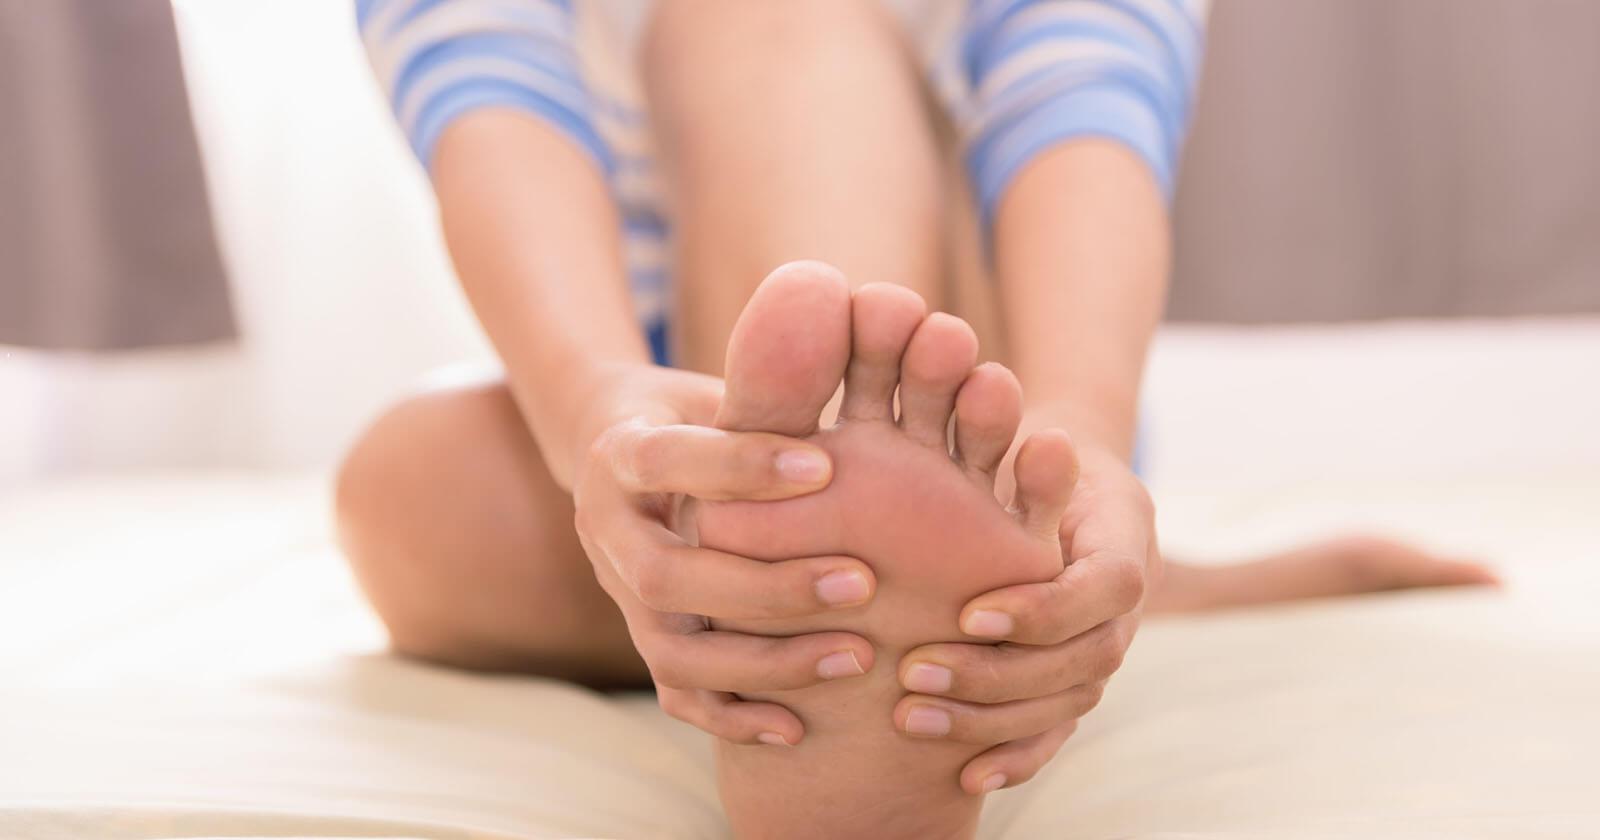 Frau fasst sich an schmerzenden Fuß wegen diabetischer Neuropathie.